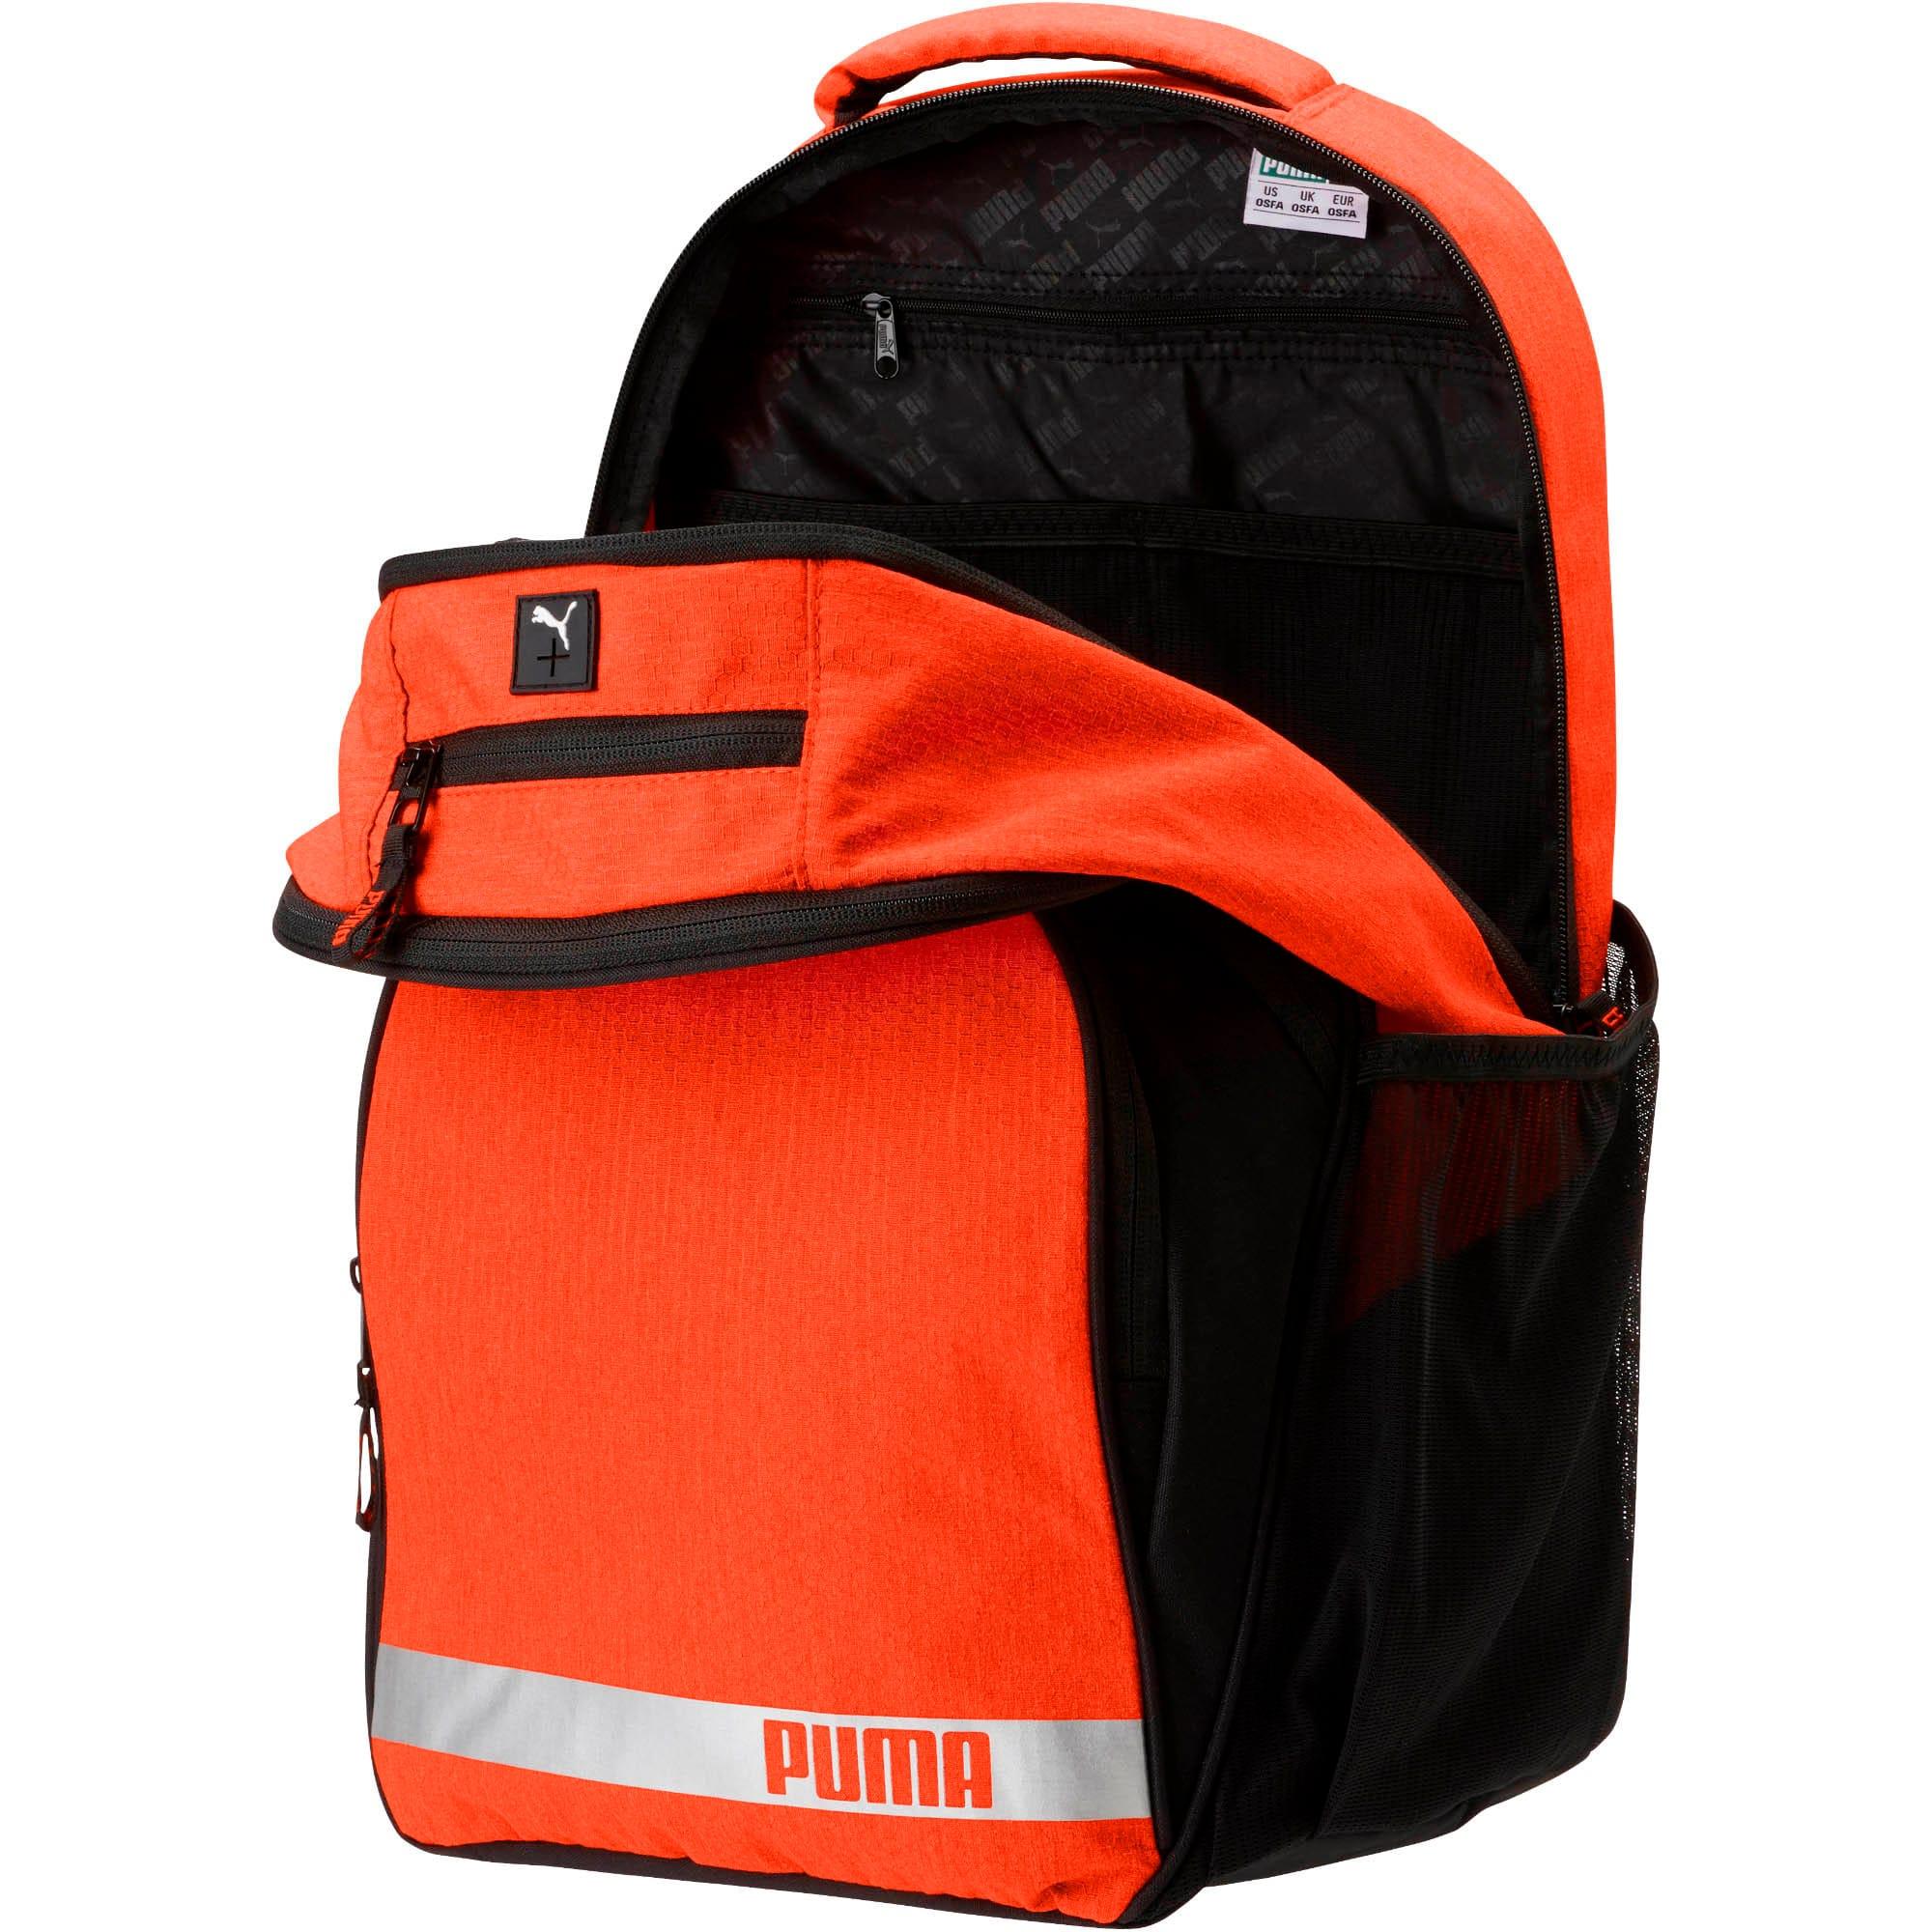 Thumbnail 2 of Formation 2.0 Ball Backpack, Orange, medium